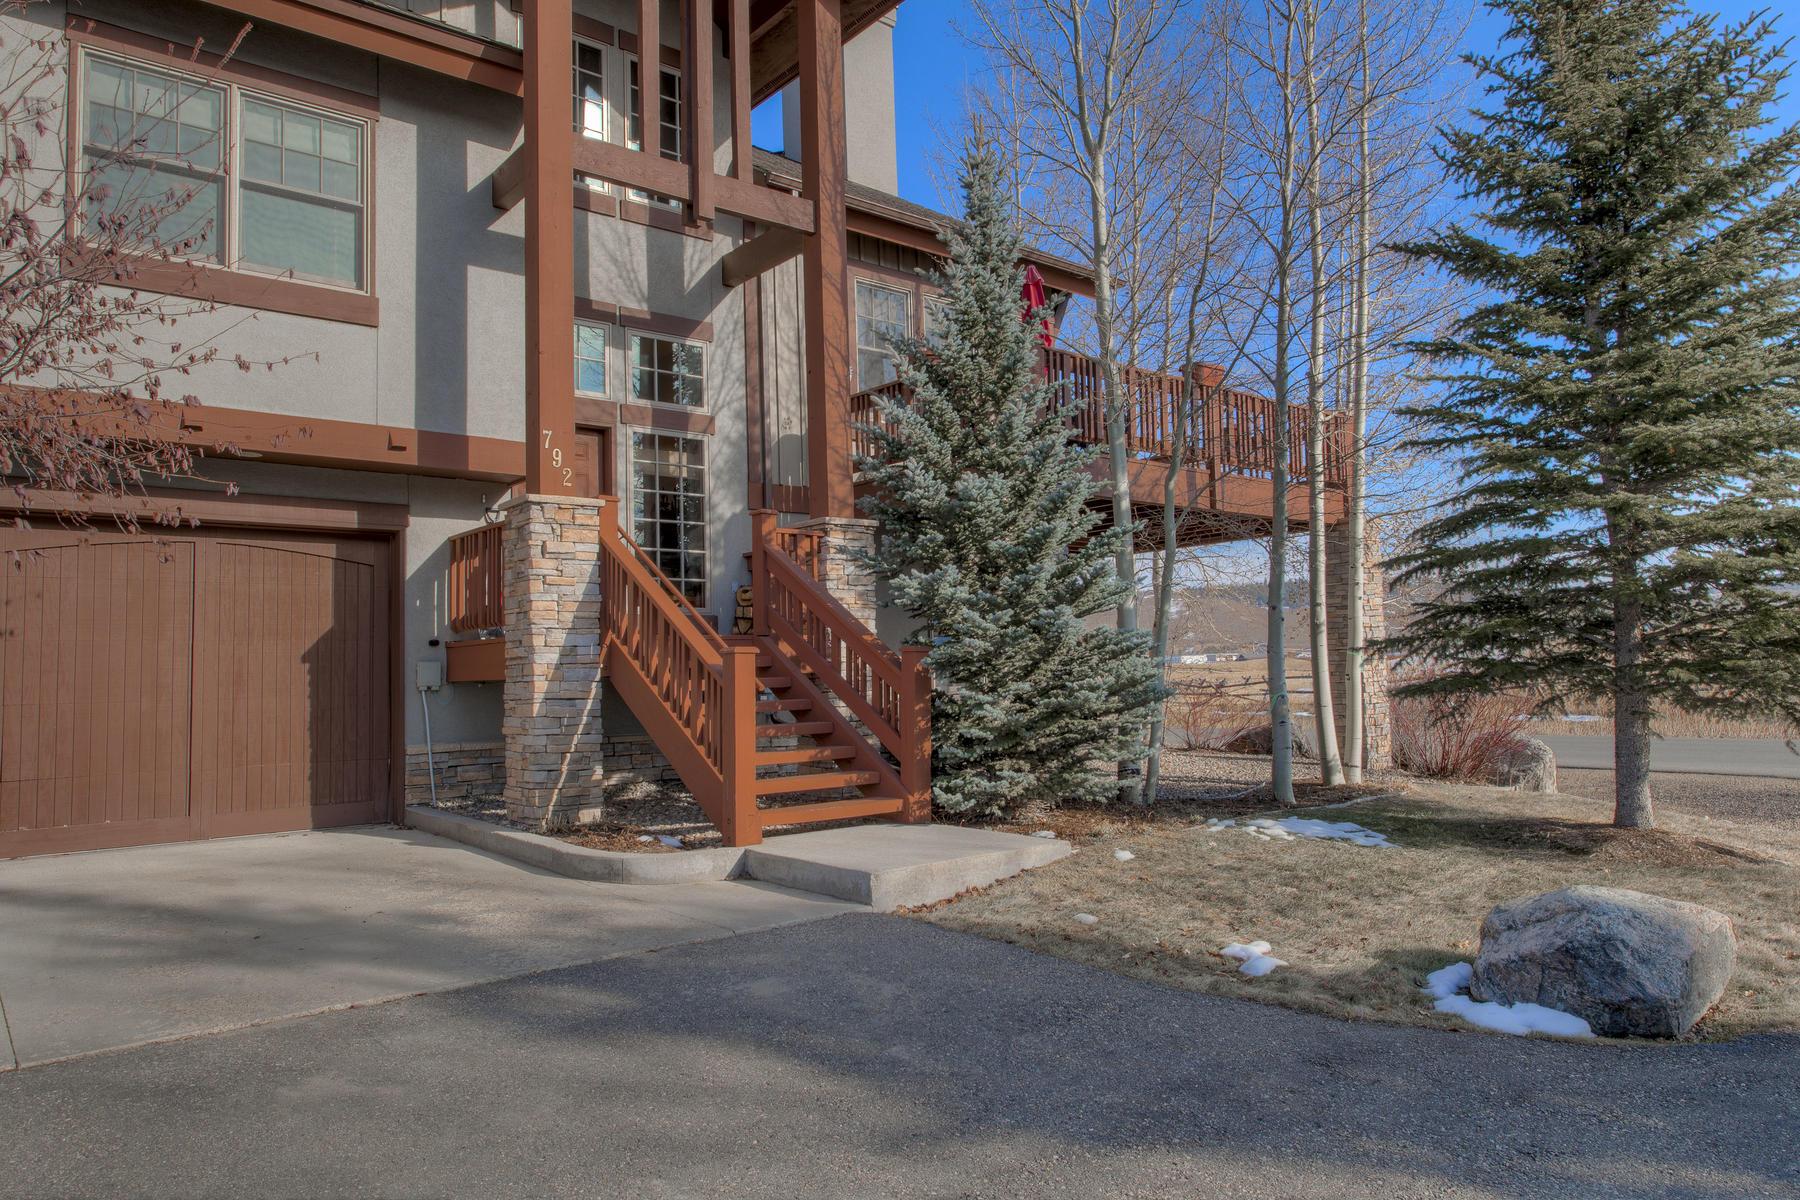 Single Family Homes のために 売買 アット Village at Horseshoe Creek 792 Ten Mile Drive Granby, コロラド 80446 アメリカ